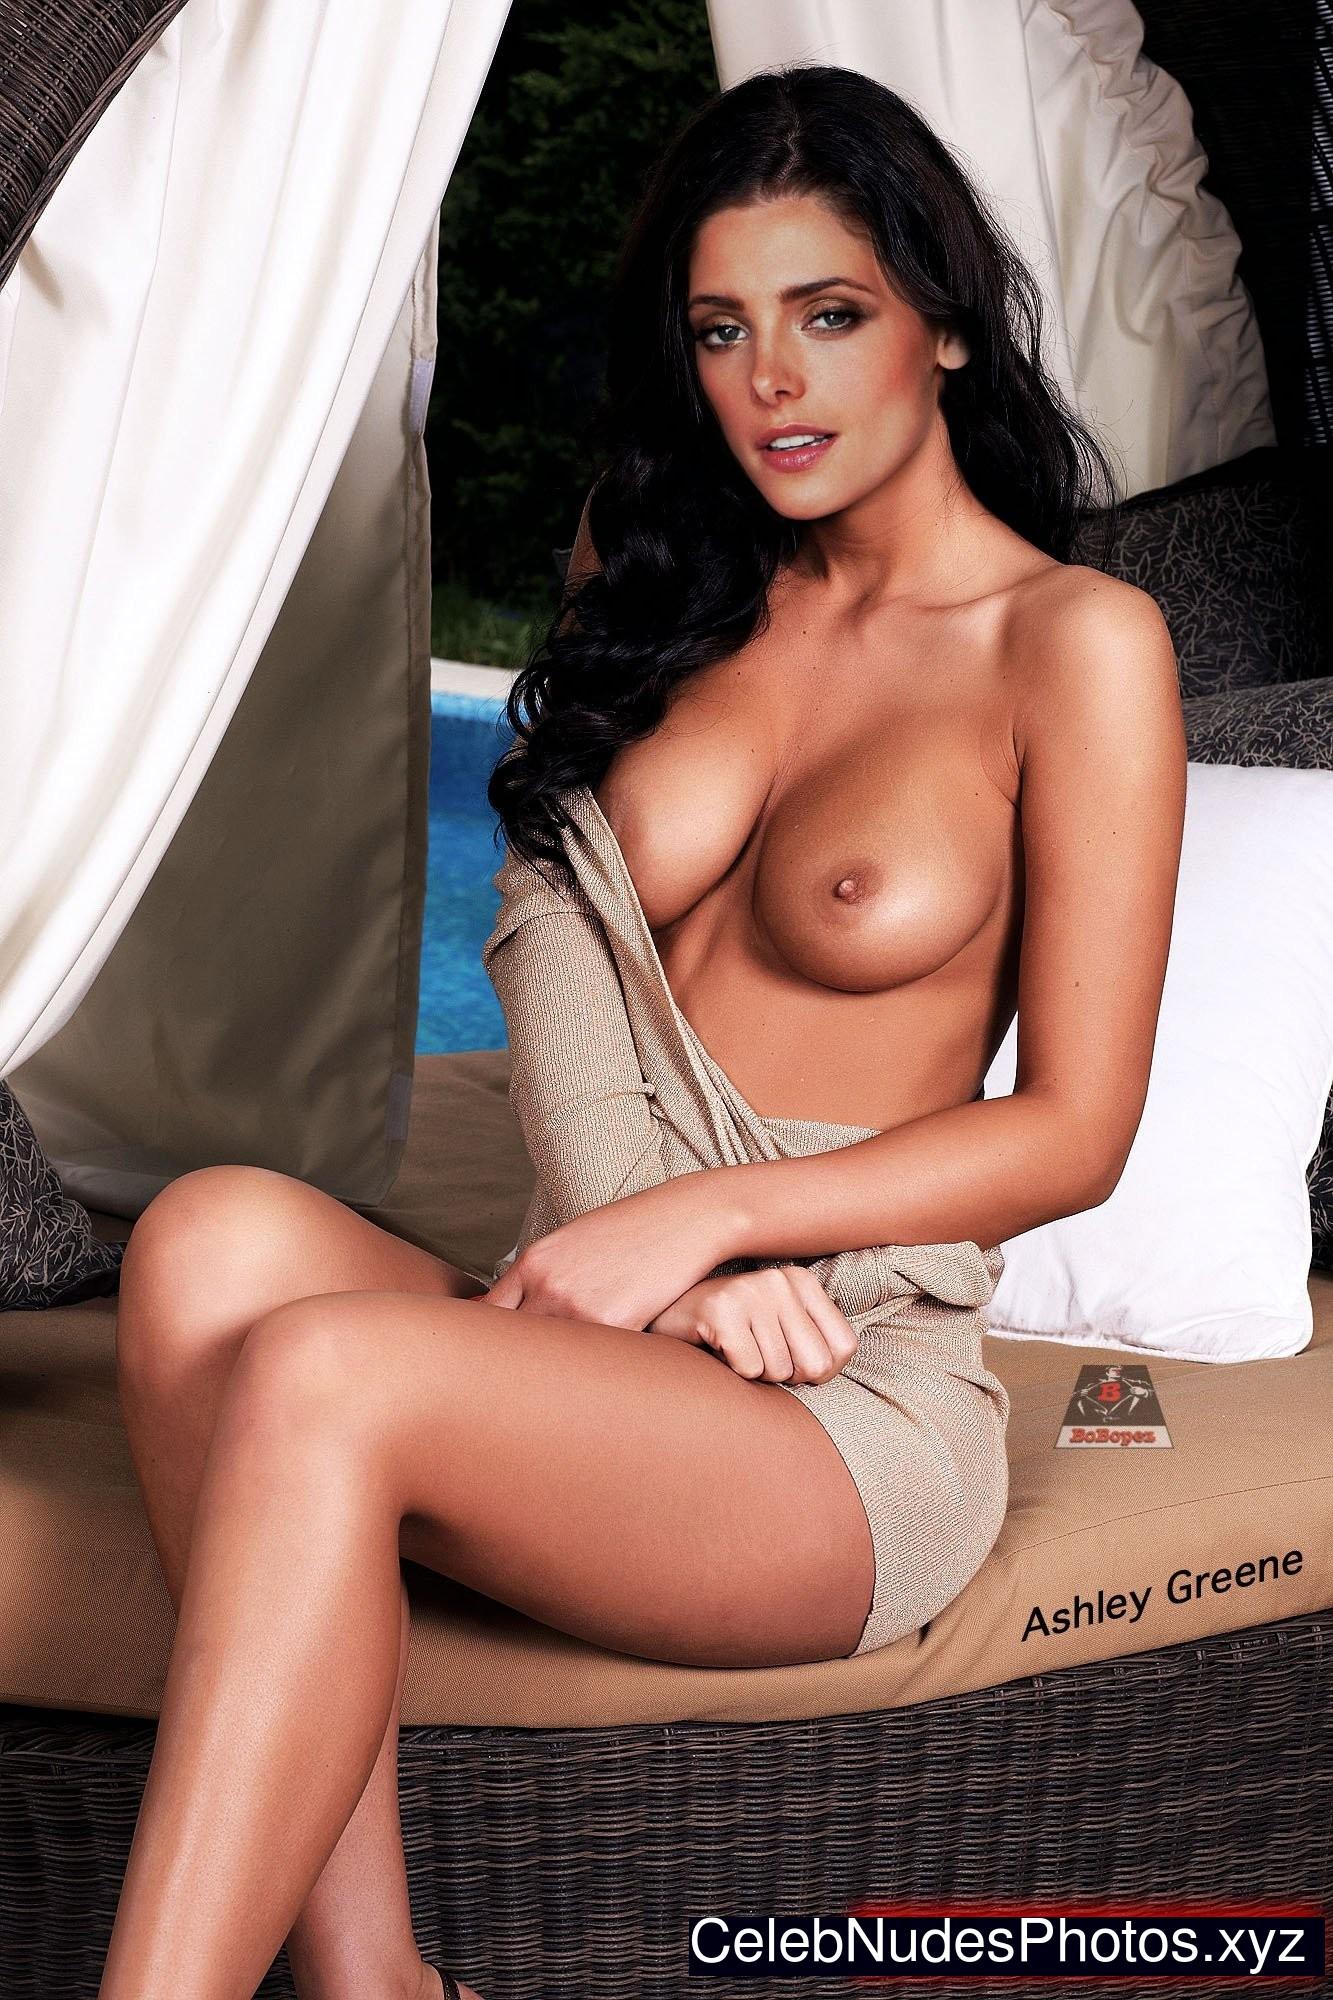 Naked images of kim kardashian naked virgin